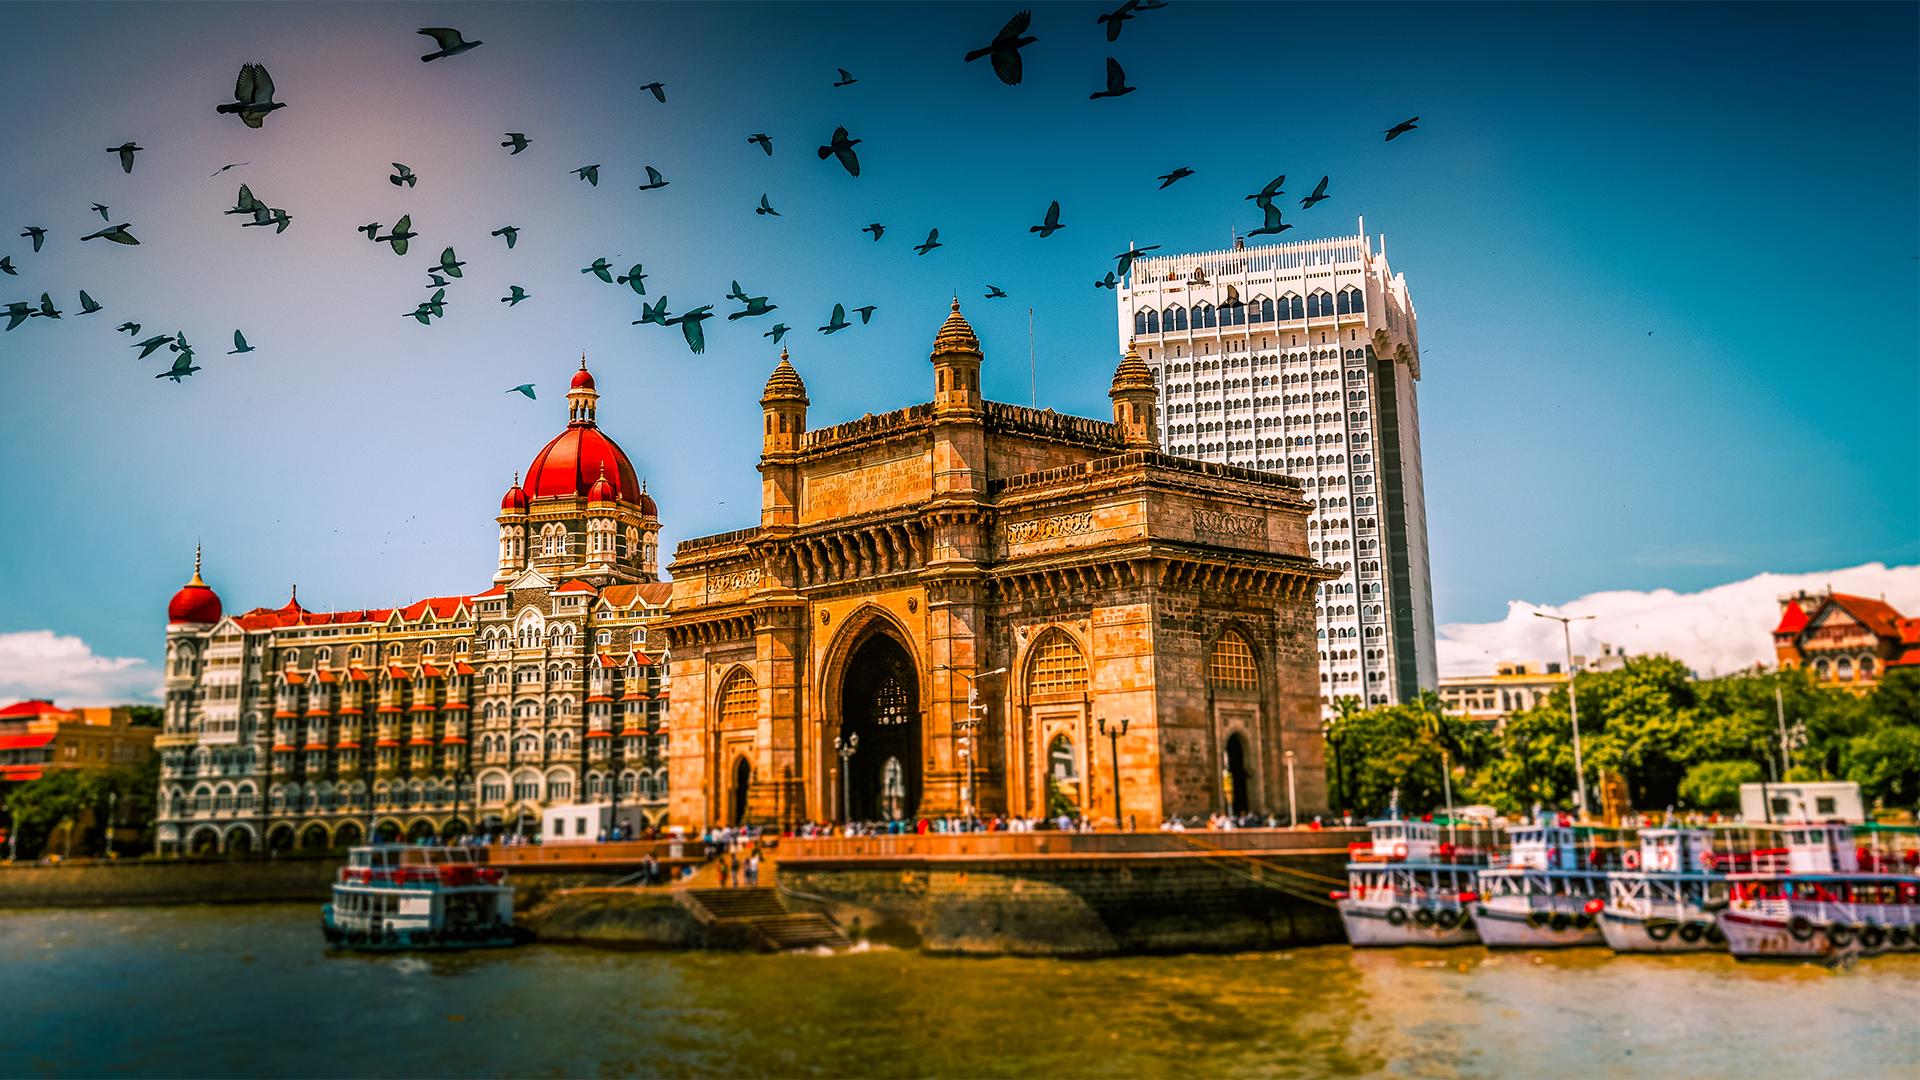 Image of Indian streatscape with Taj Mahal